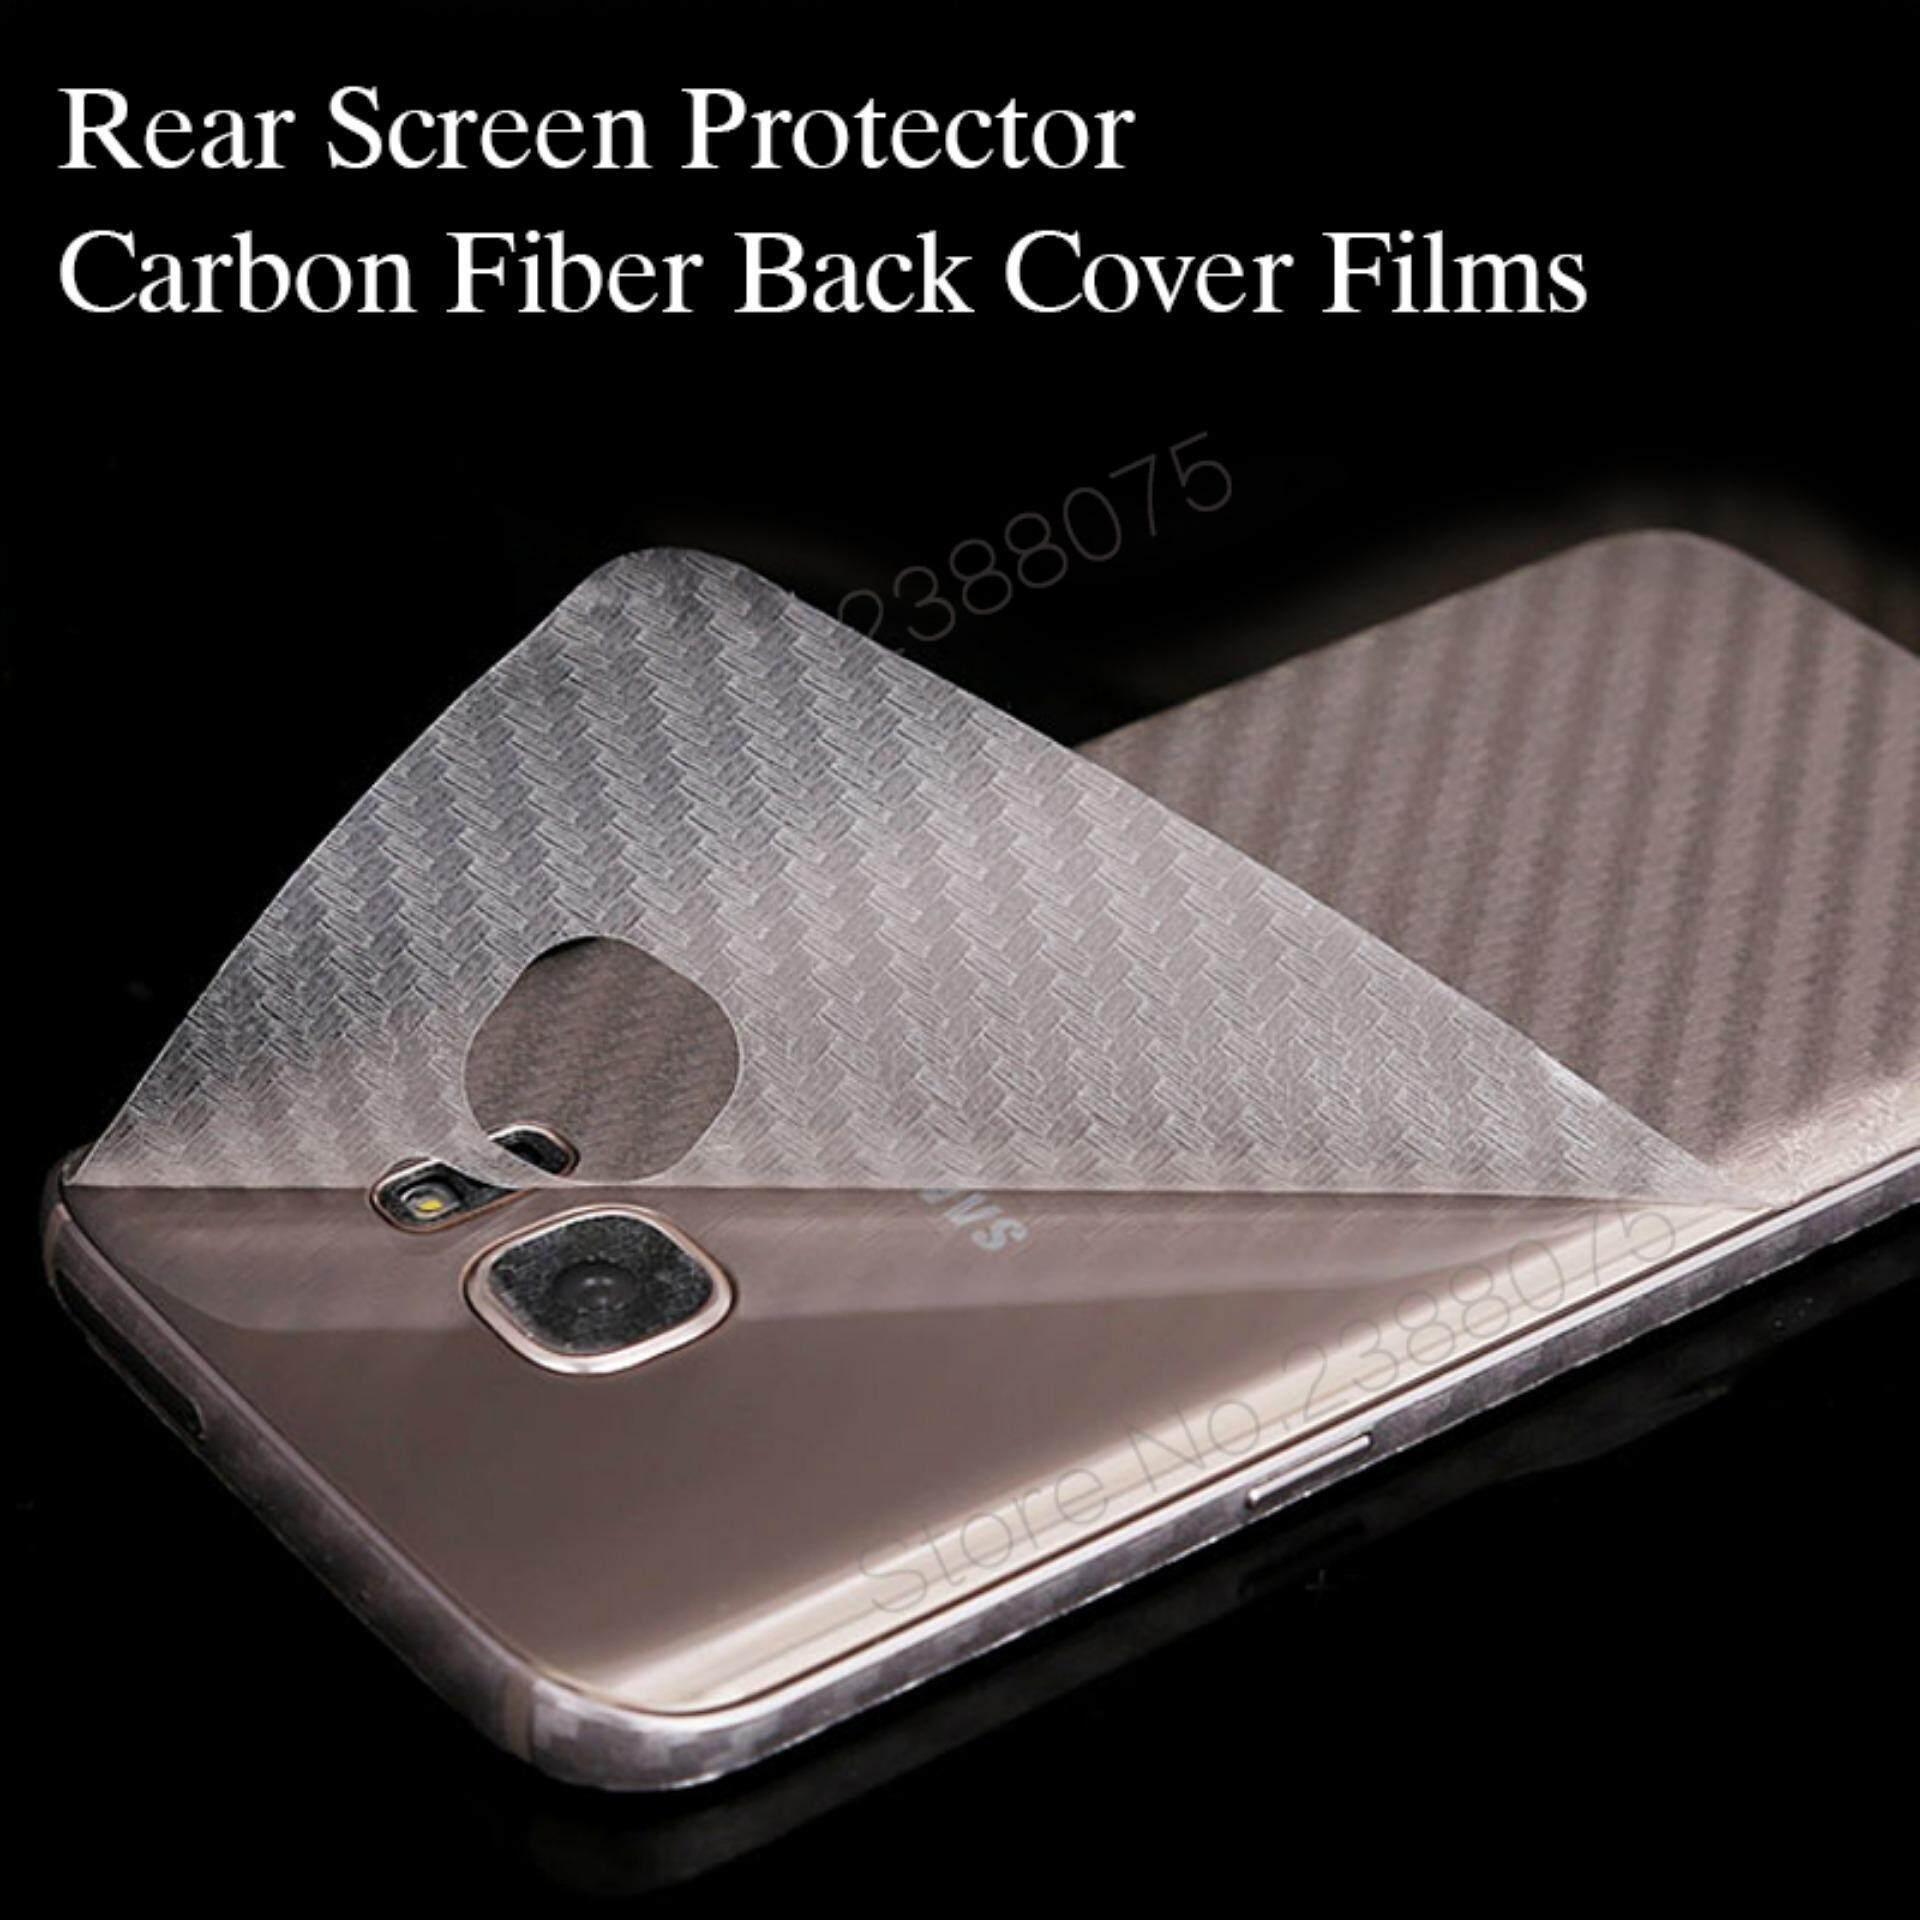 Features Luxury 3d Carbon Fiber Transparent Back Cover Screen